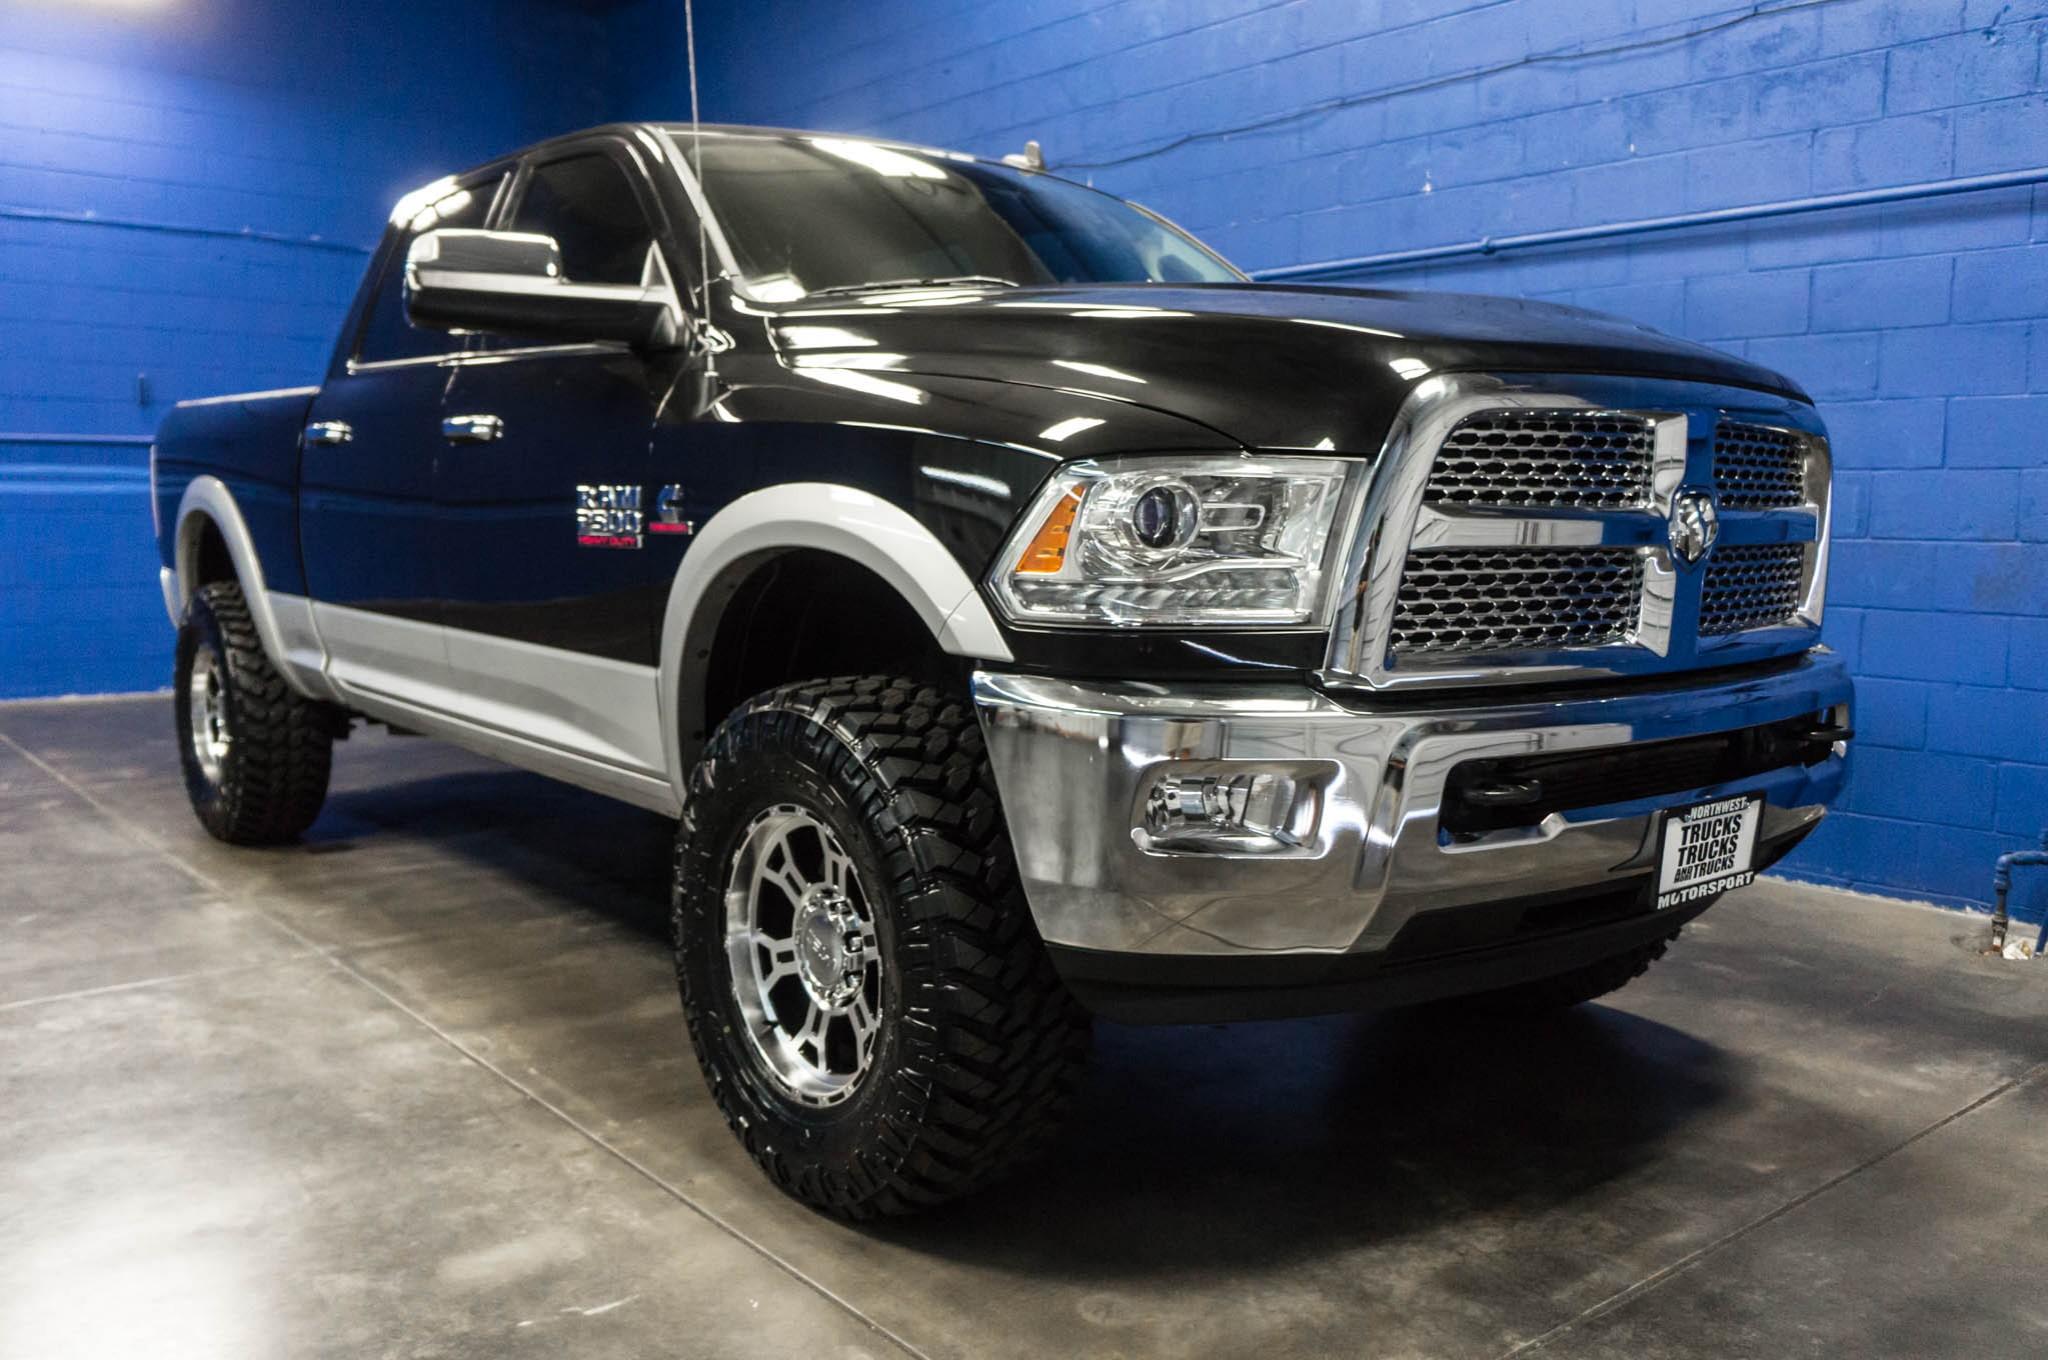 used lifted 2015 dodge ram 2500 laramie 4x4 diesel truck for sale 34949. Black Bedroom Furniture Sets. Home Design Ideas